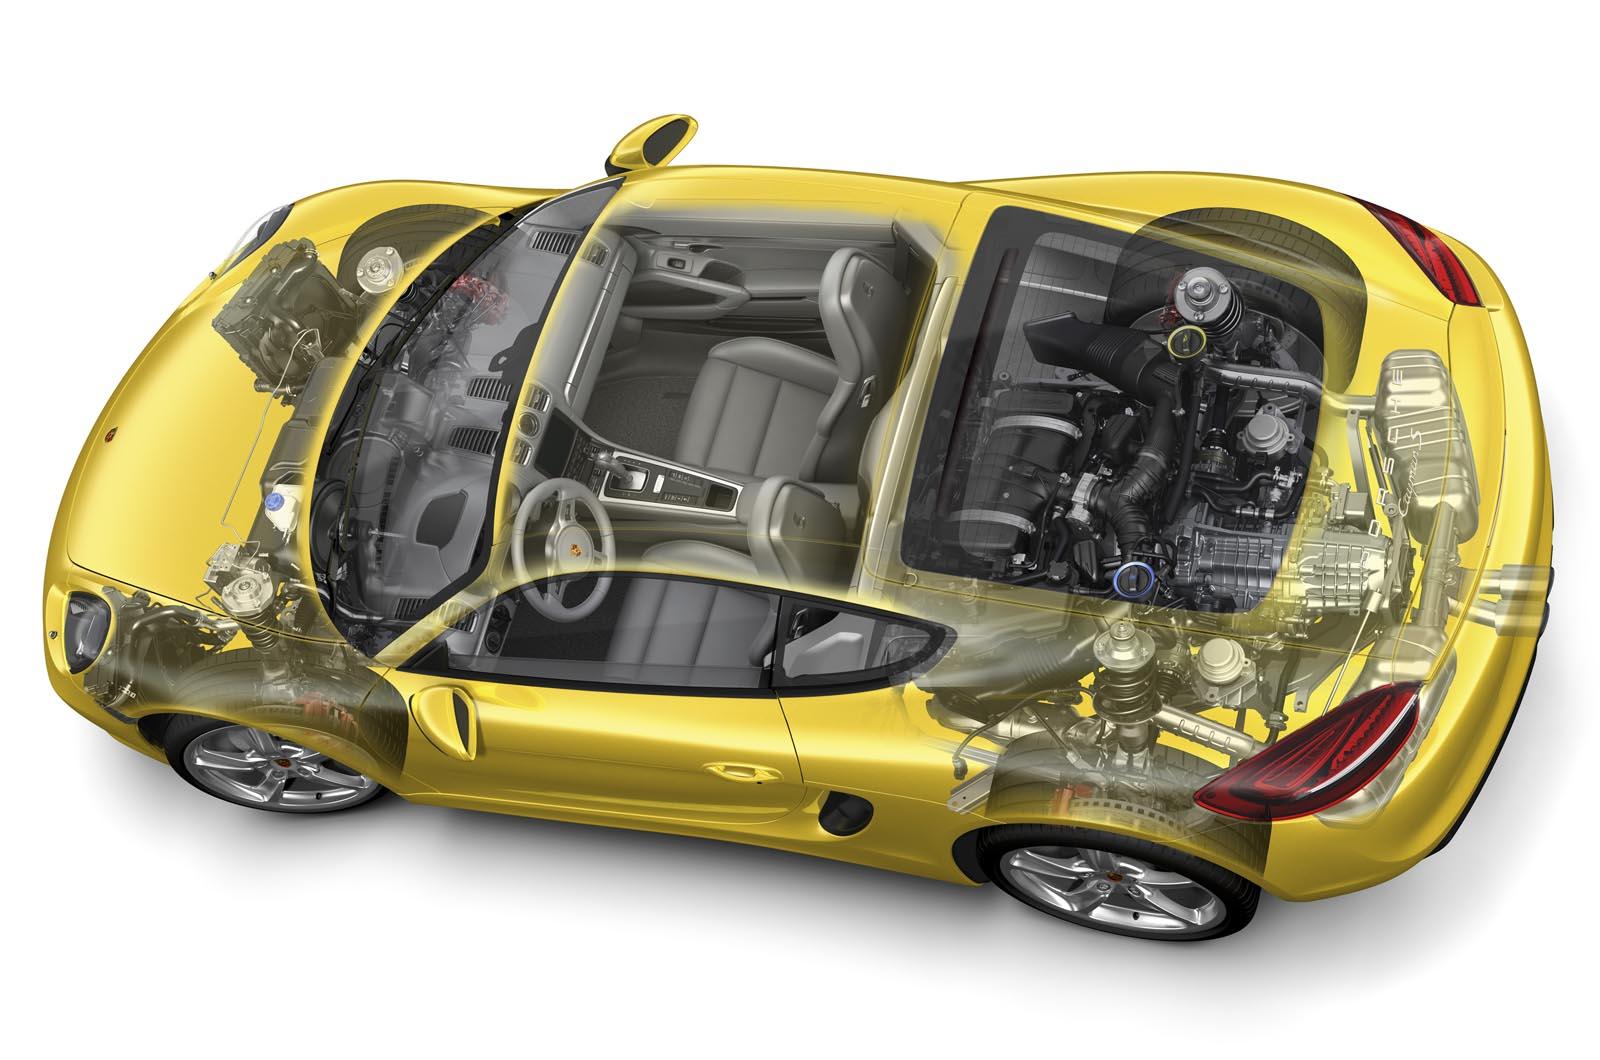 2013 Porsche Boxster Engine Diagram Expert Category Circuit Cutaway Drawings Highlight Cayman Tech Autocar Rh Co Uk